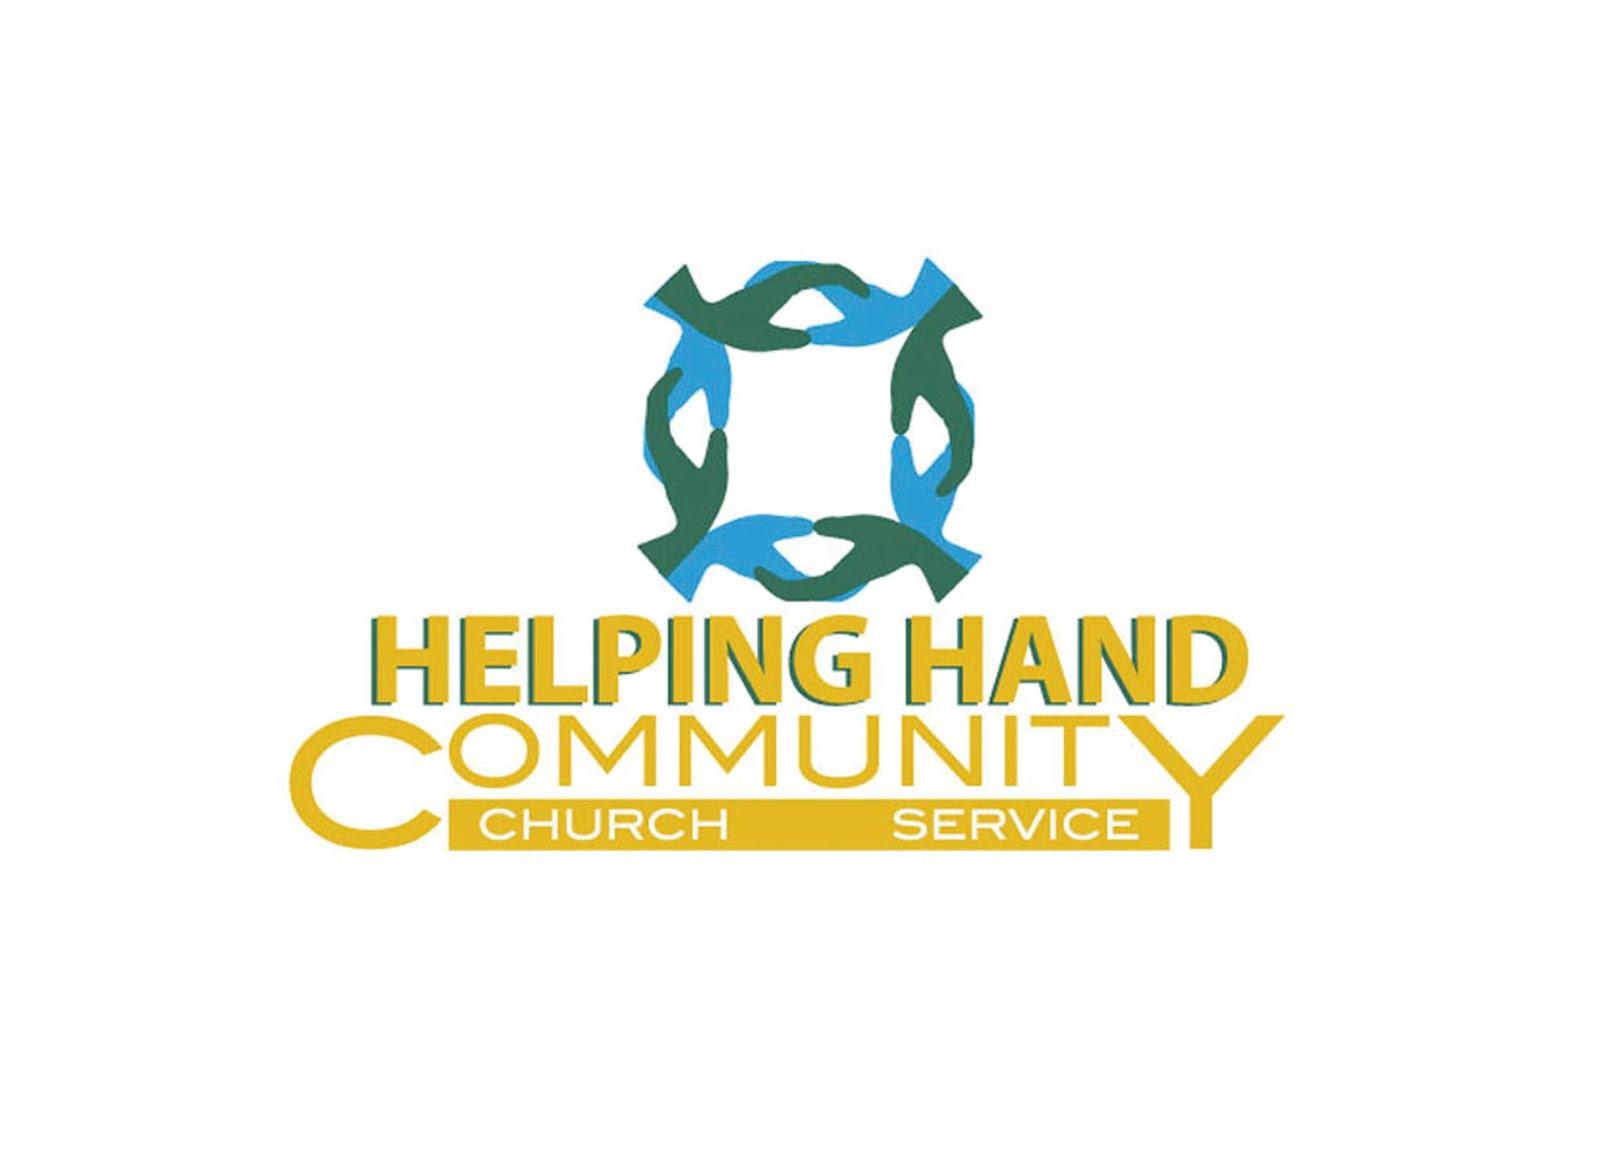 community service help